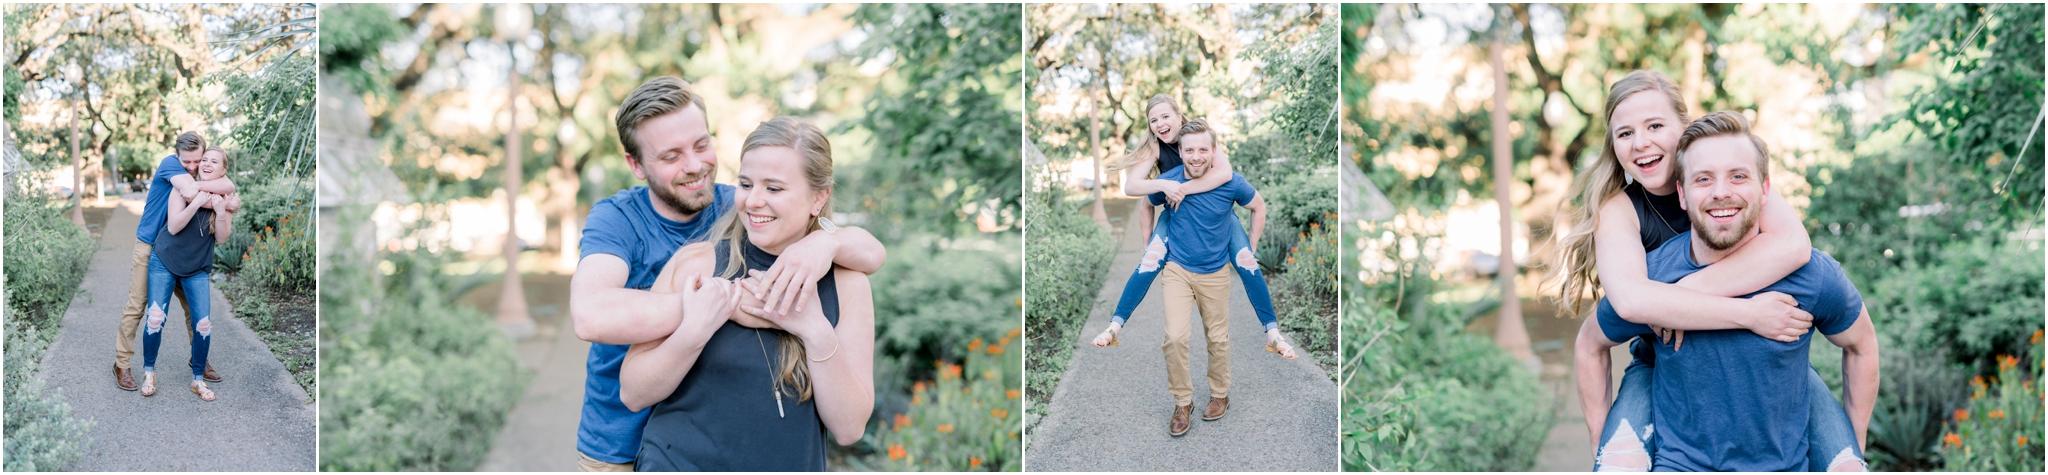 Allison&Colton_0015.jpg